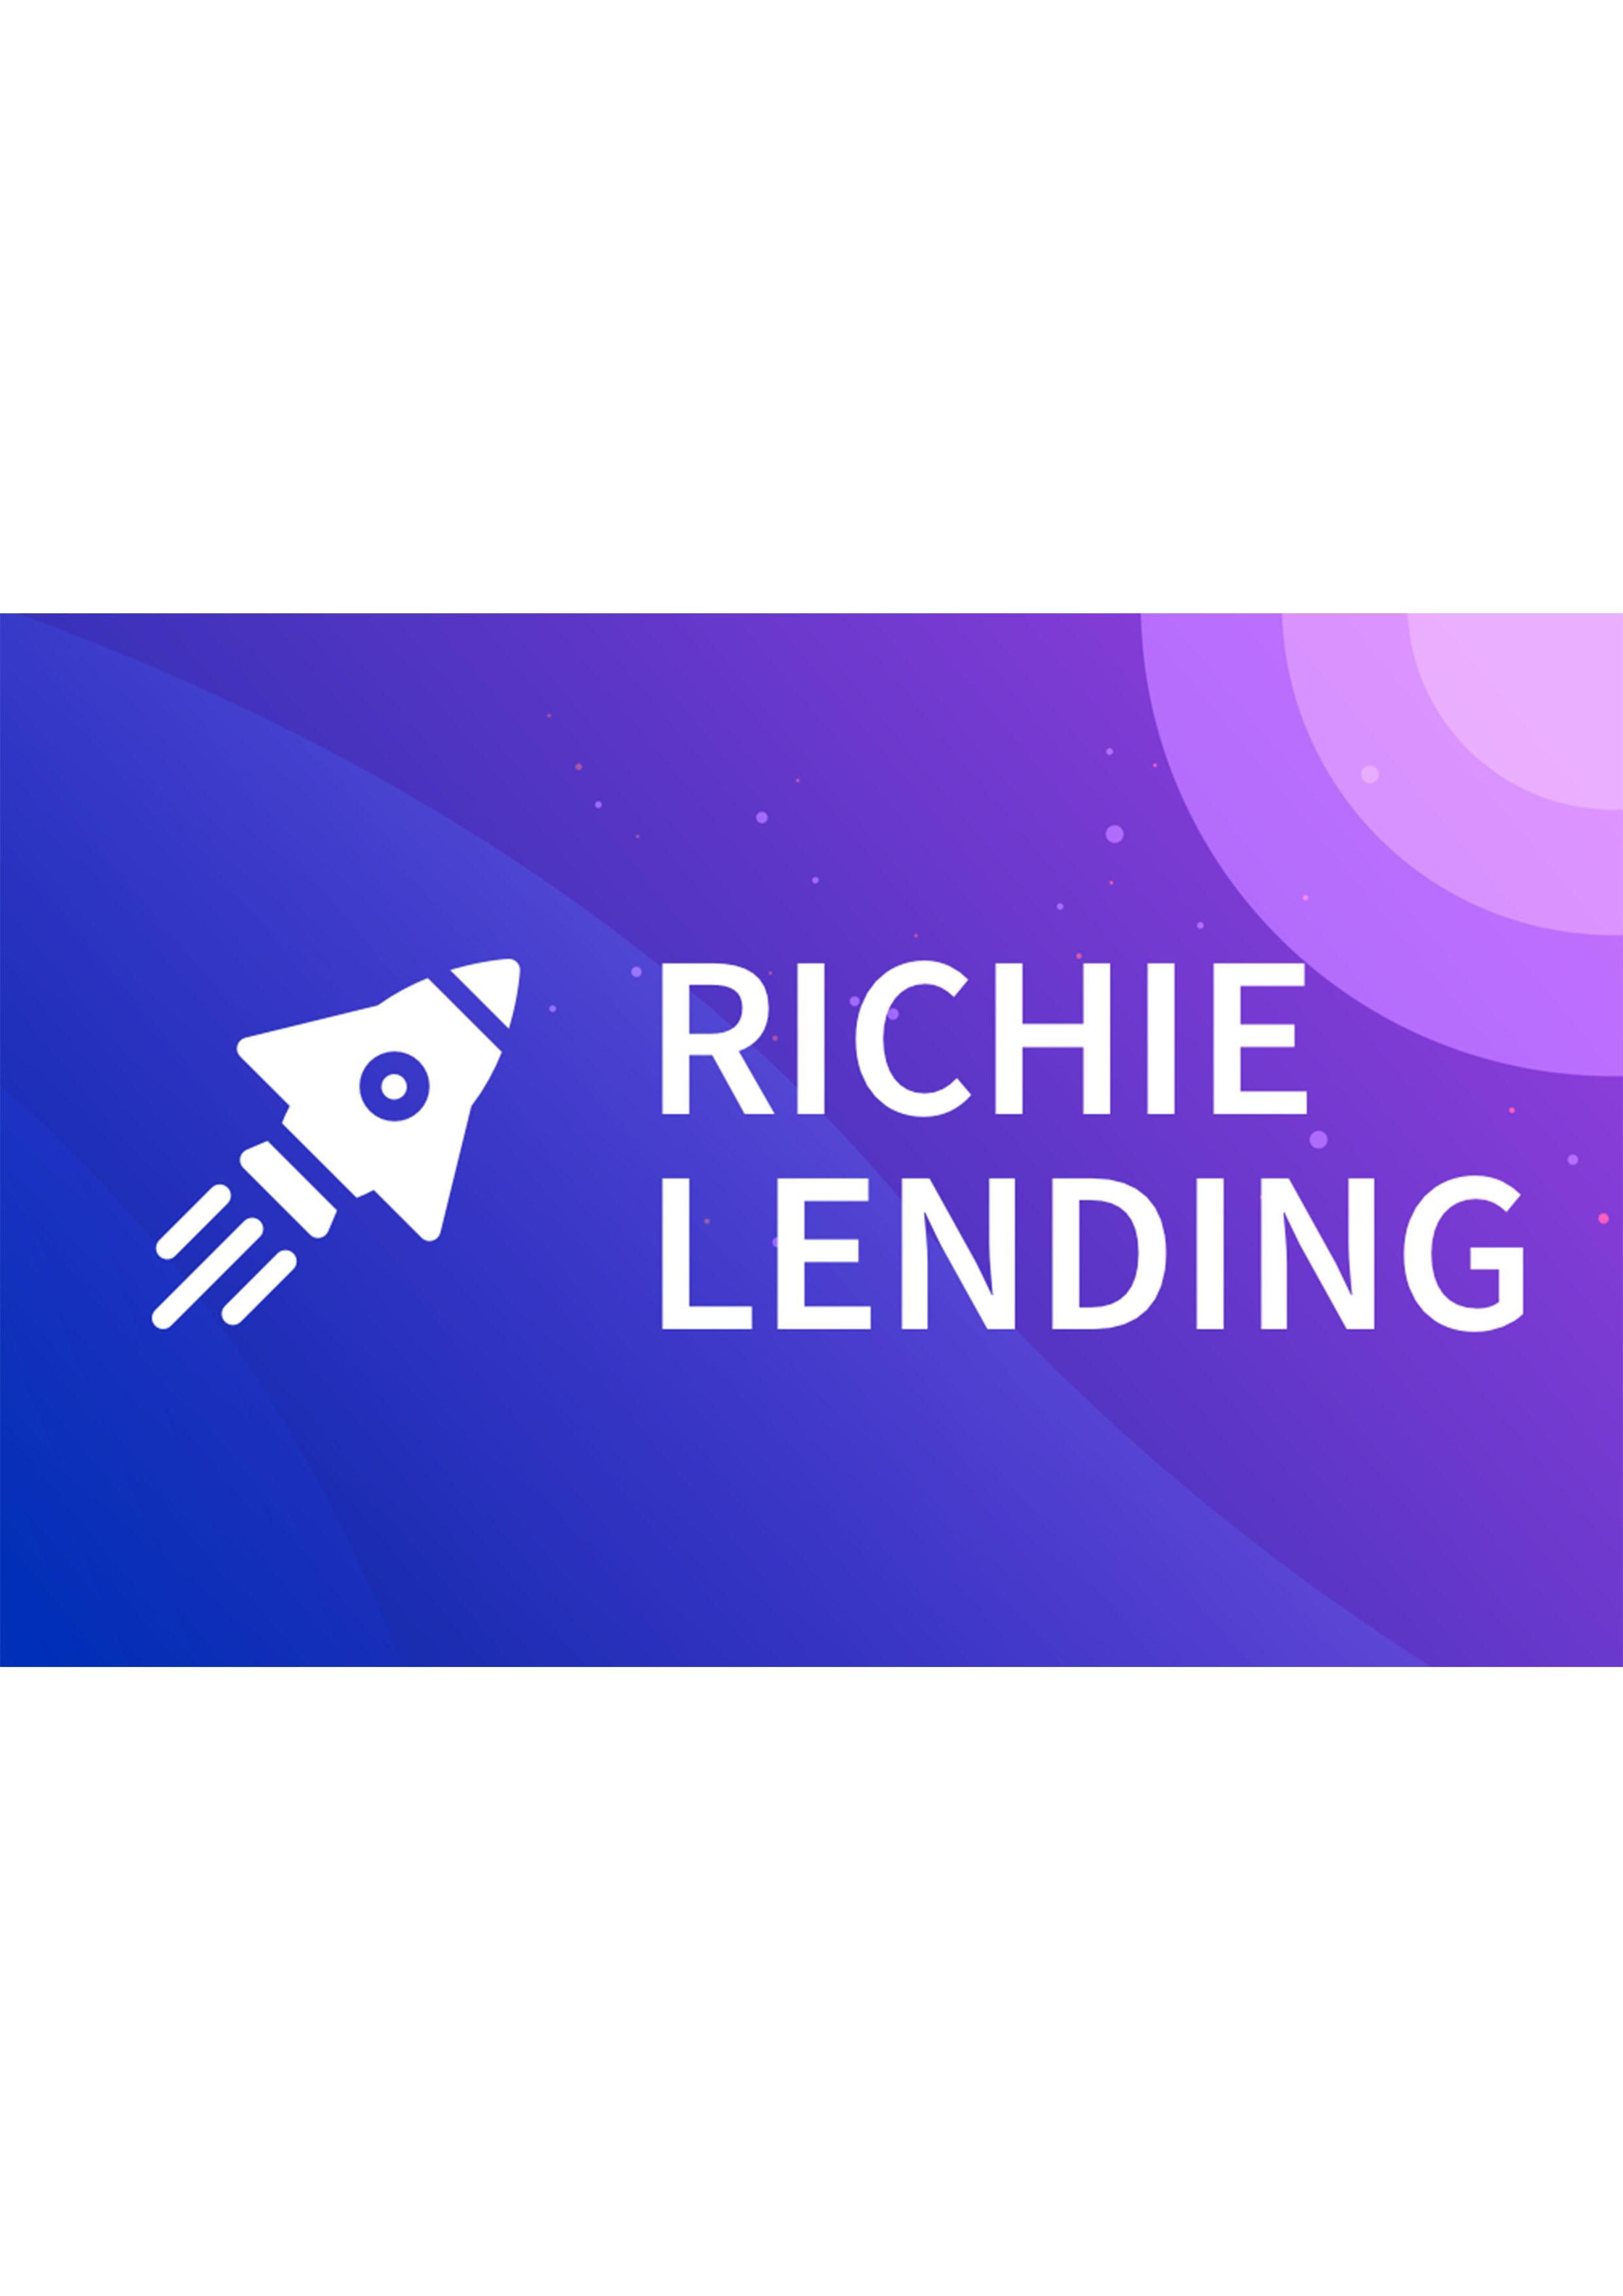 RichieLending.jpg